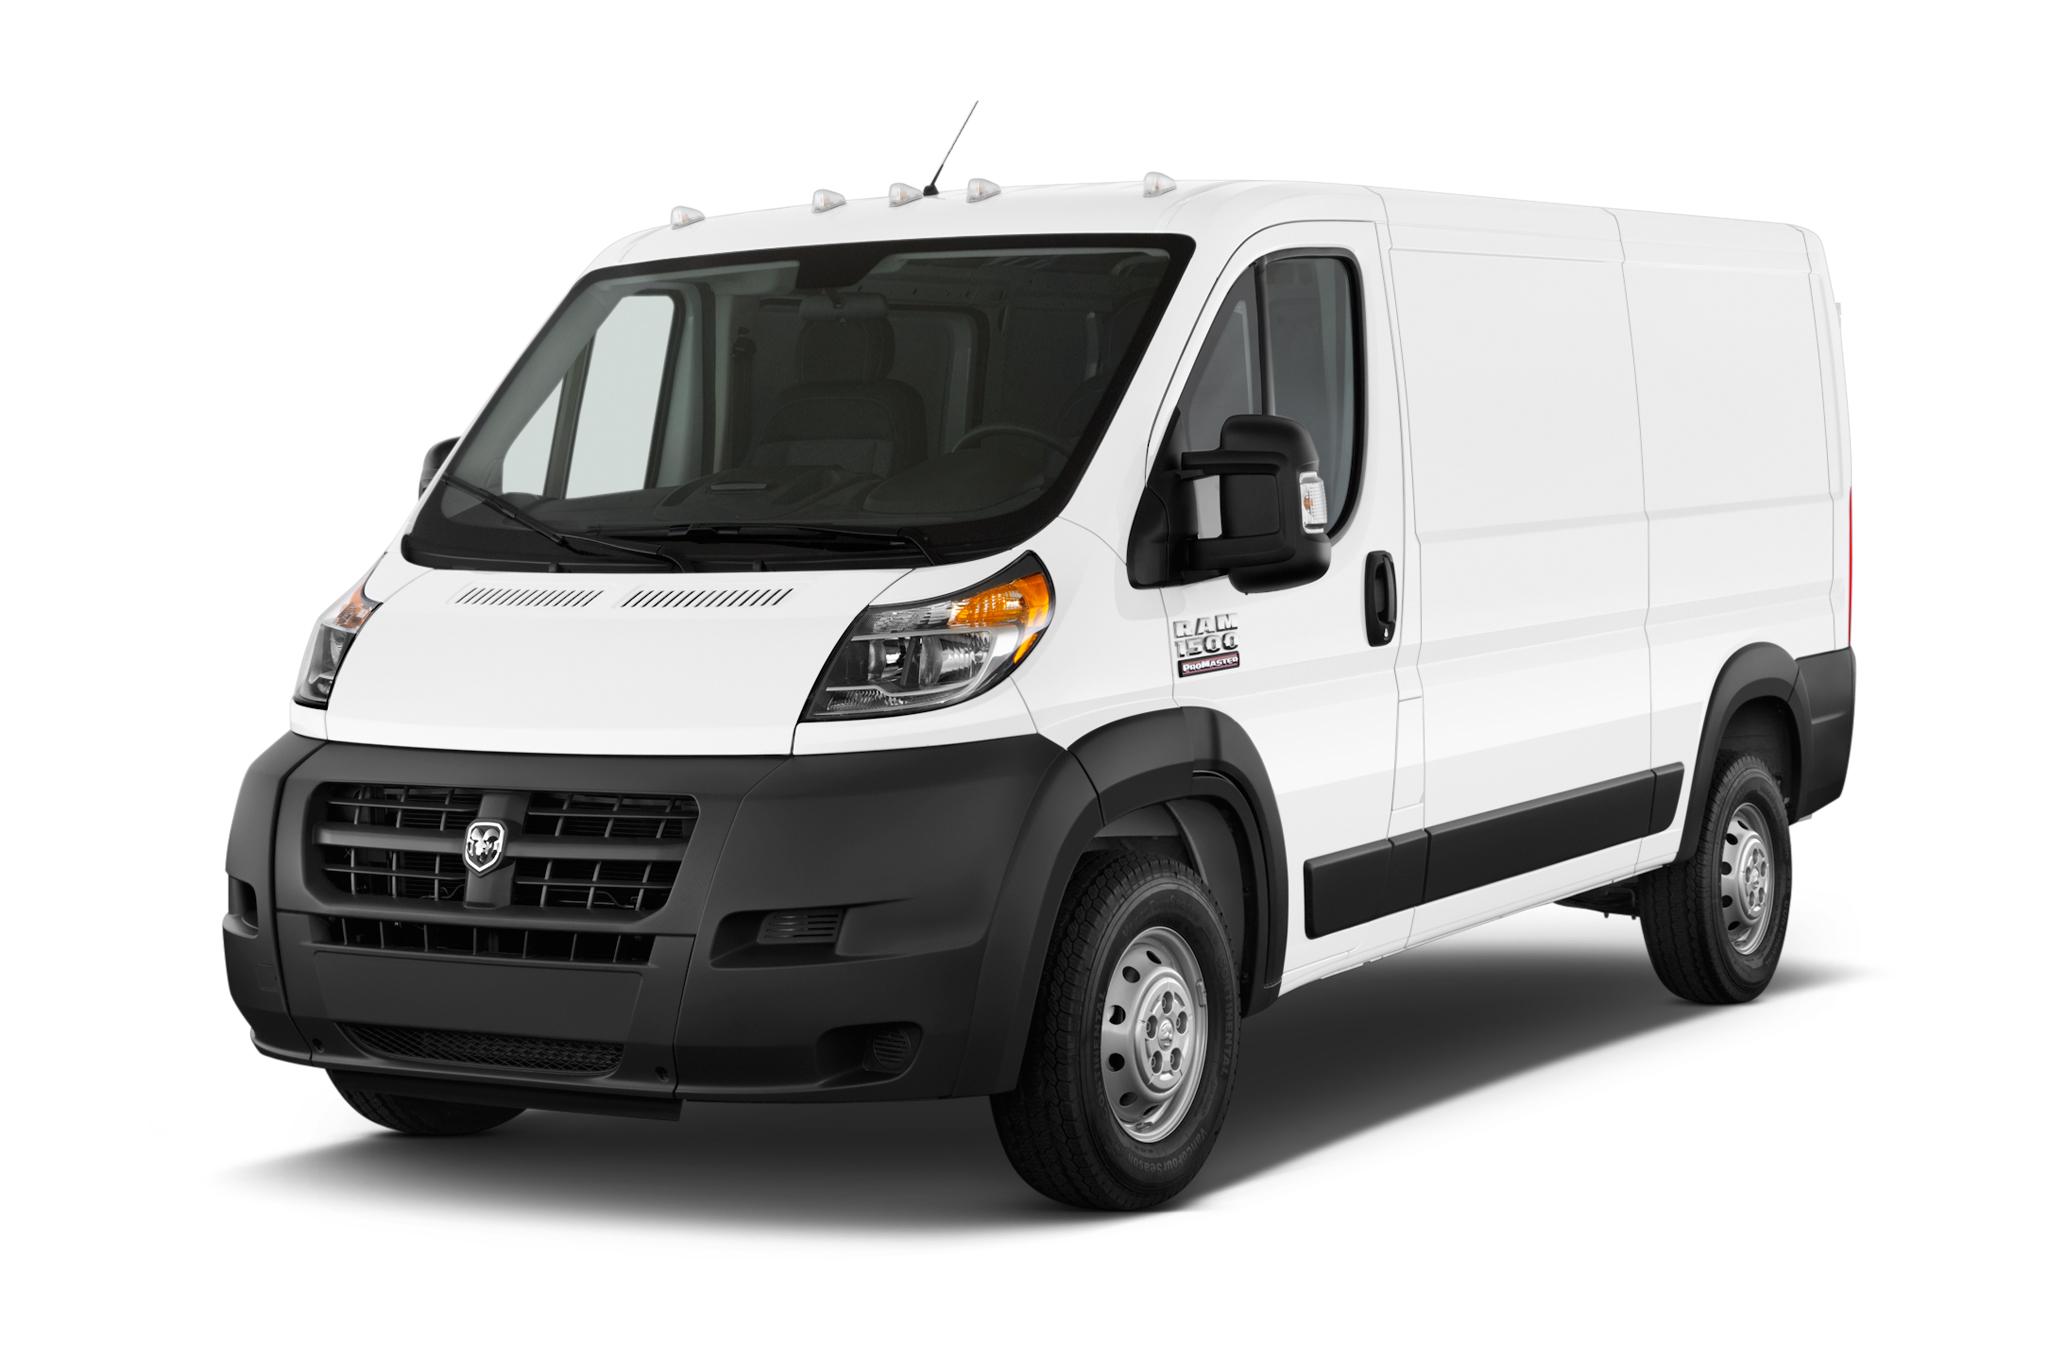 2015-ram-promaster-cargo-van-angular-front.jpg